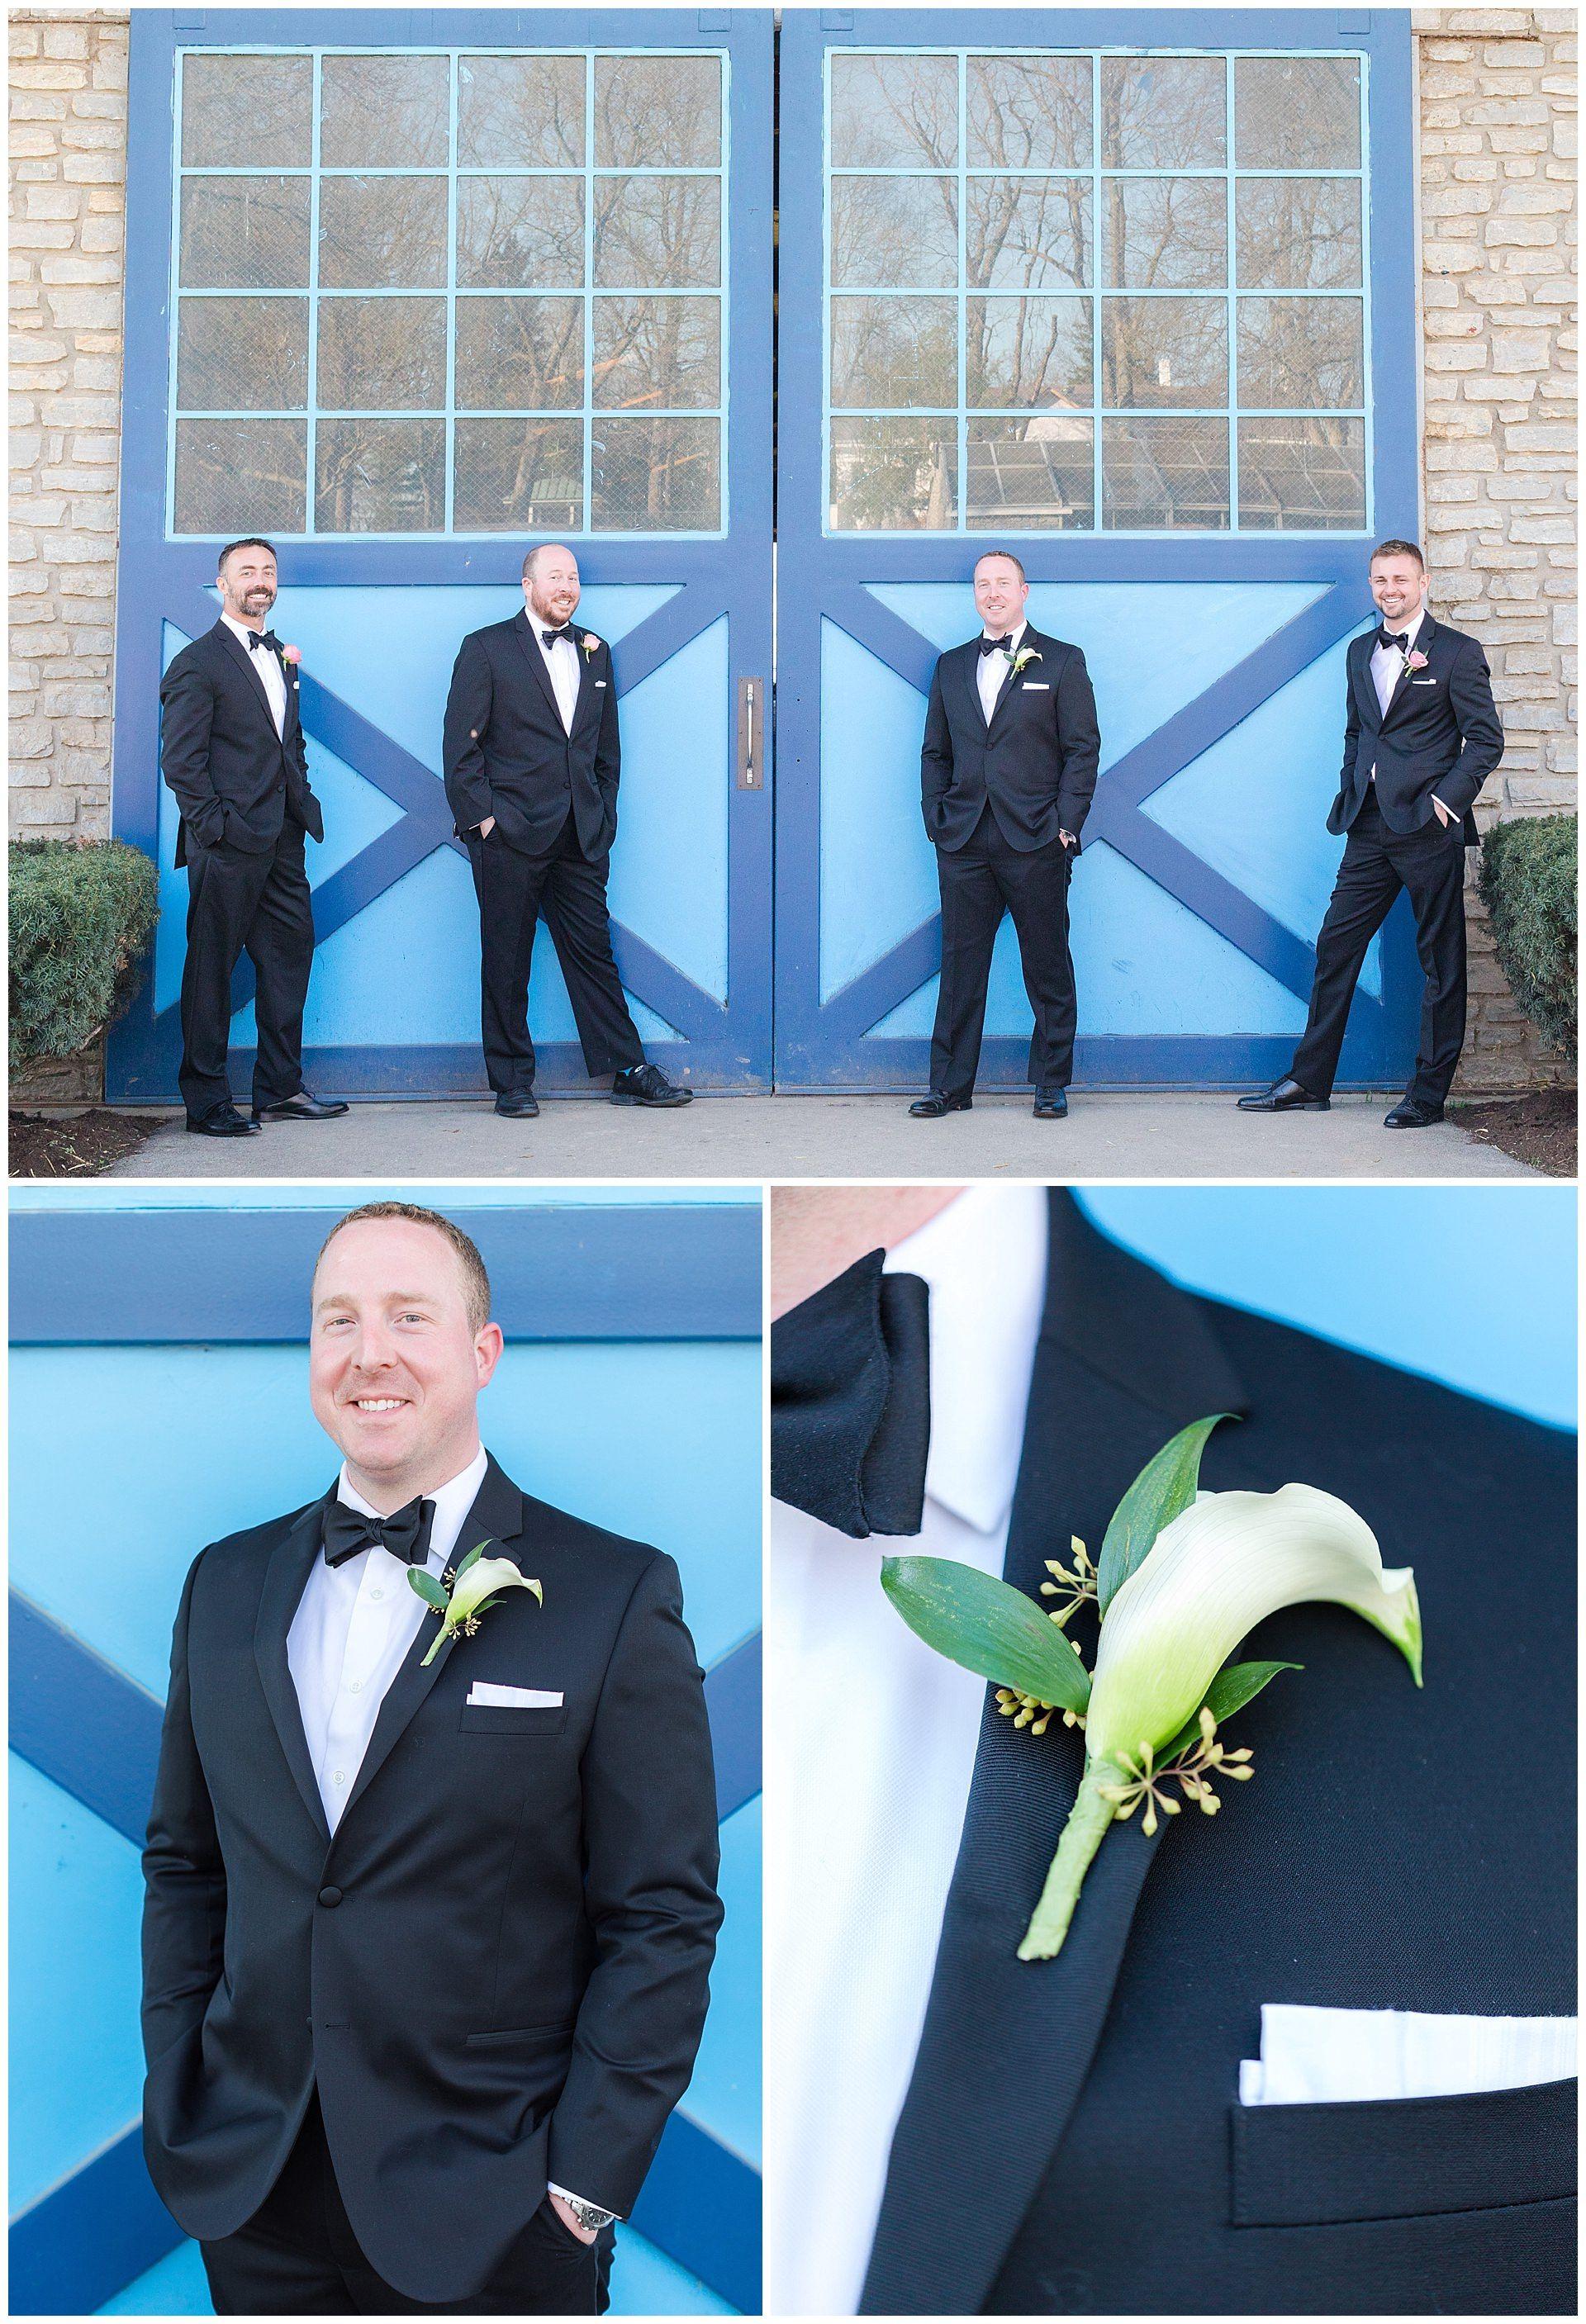 Spring Wedding On A Private Horse Farm in Lexington, KY | Pinterest ...